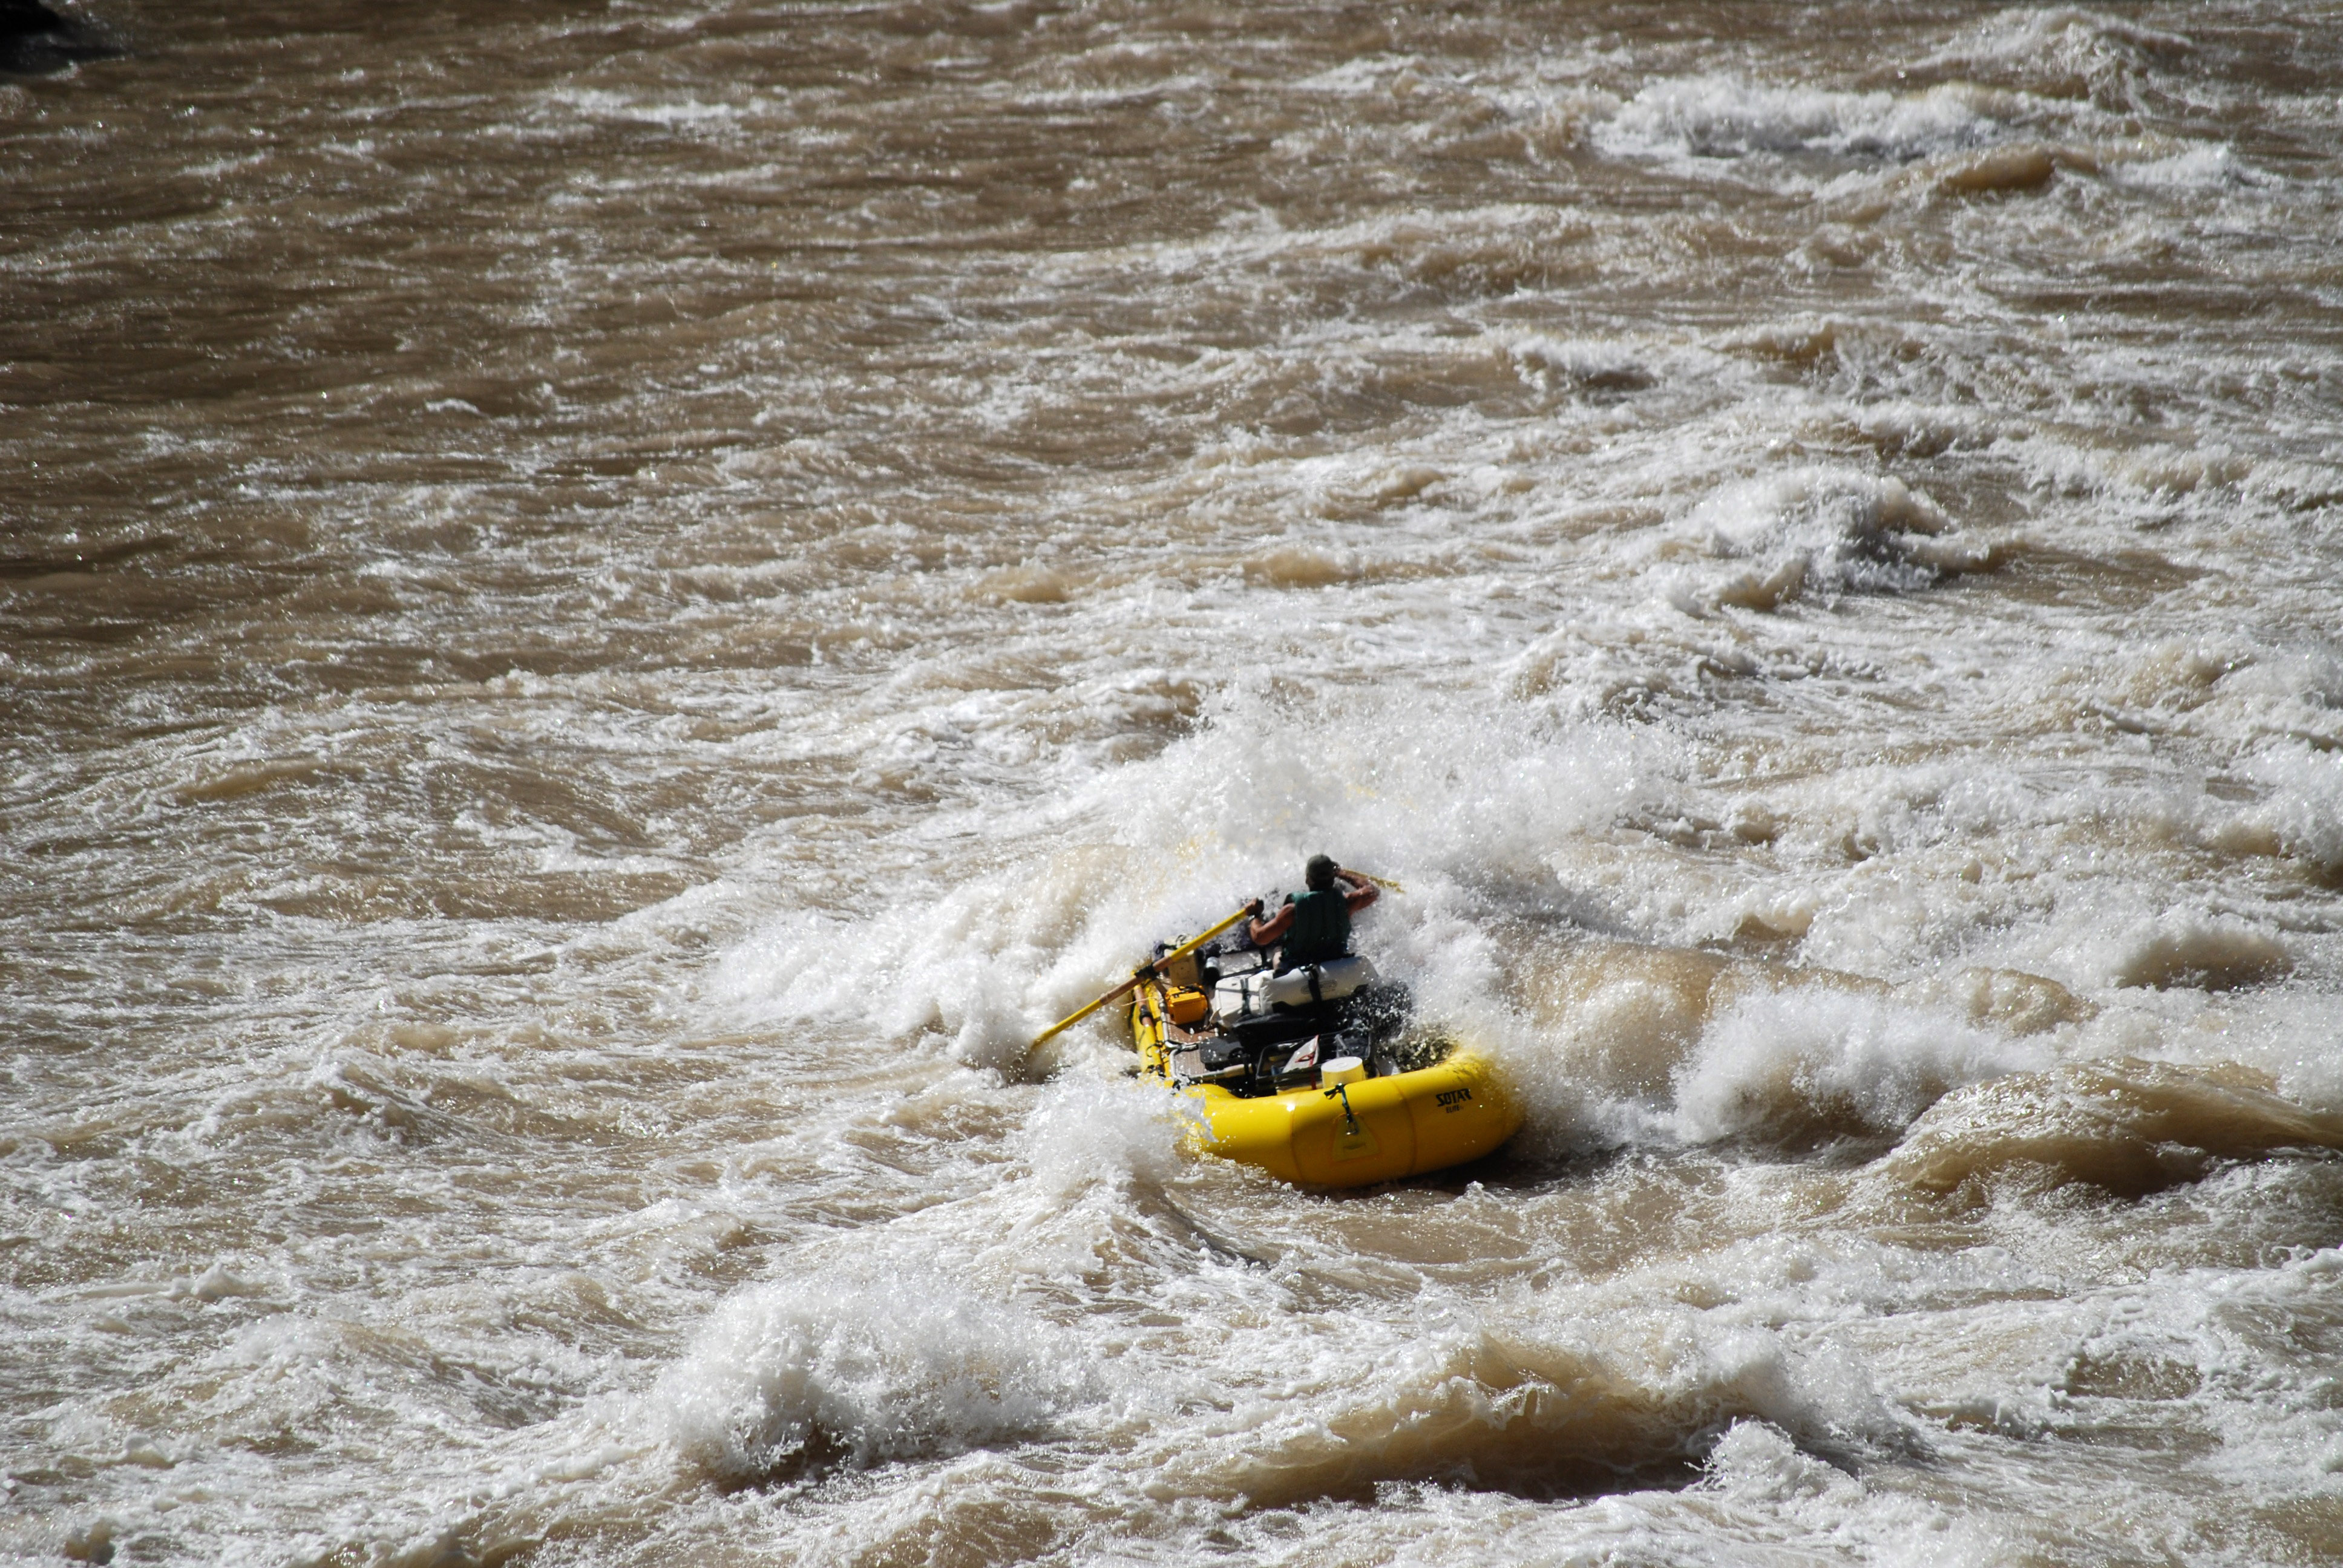 [Image: rafting-in-the-colorado-river-grand-canyon-arizona.jpg]